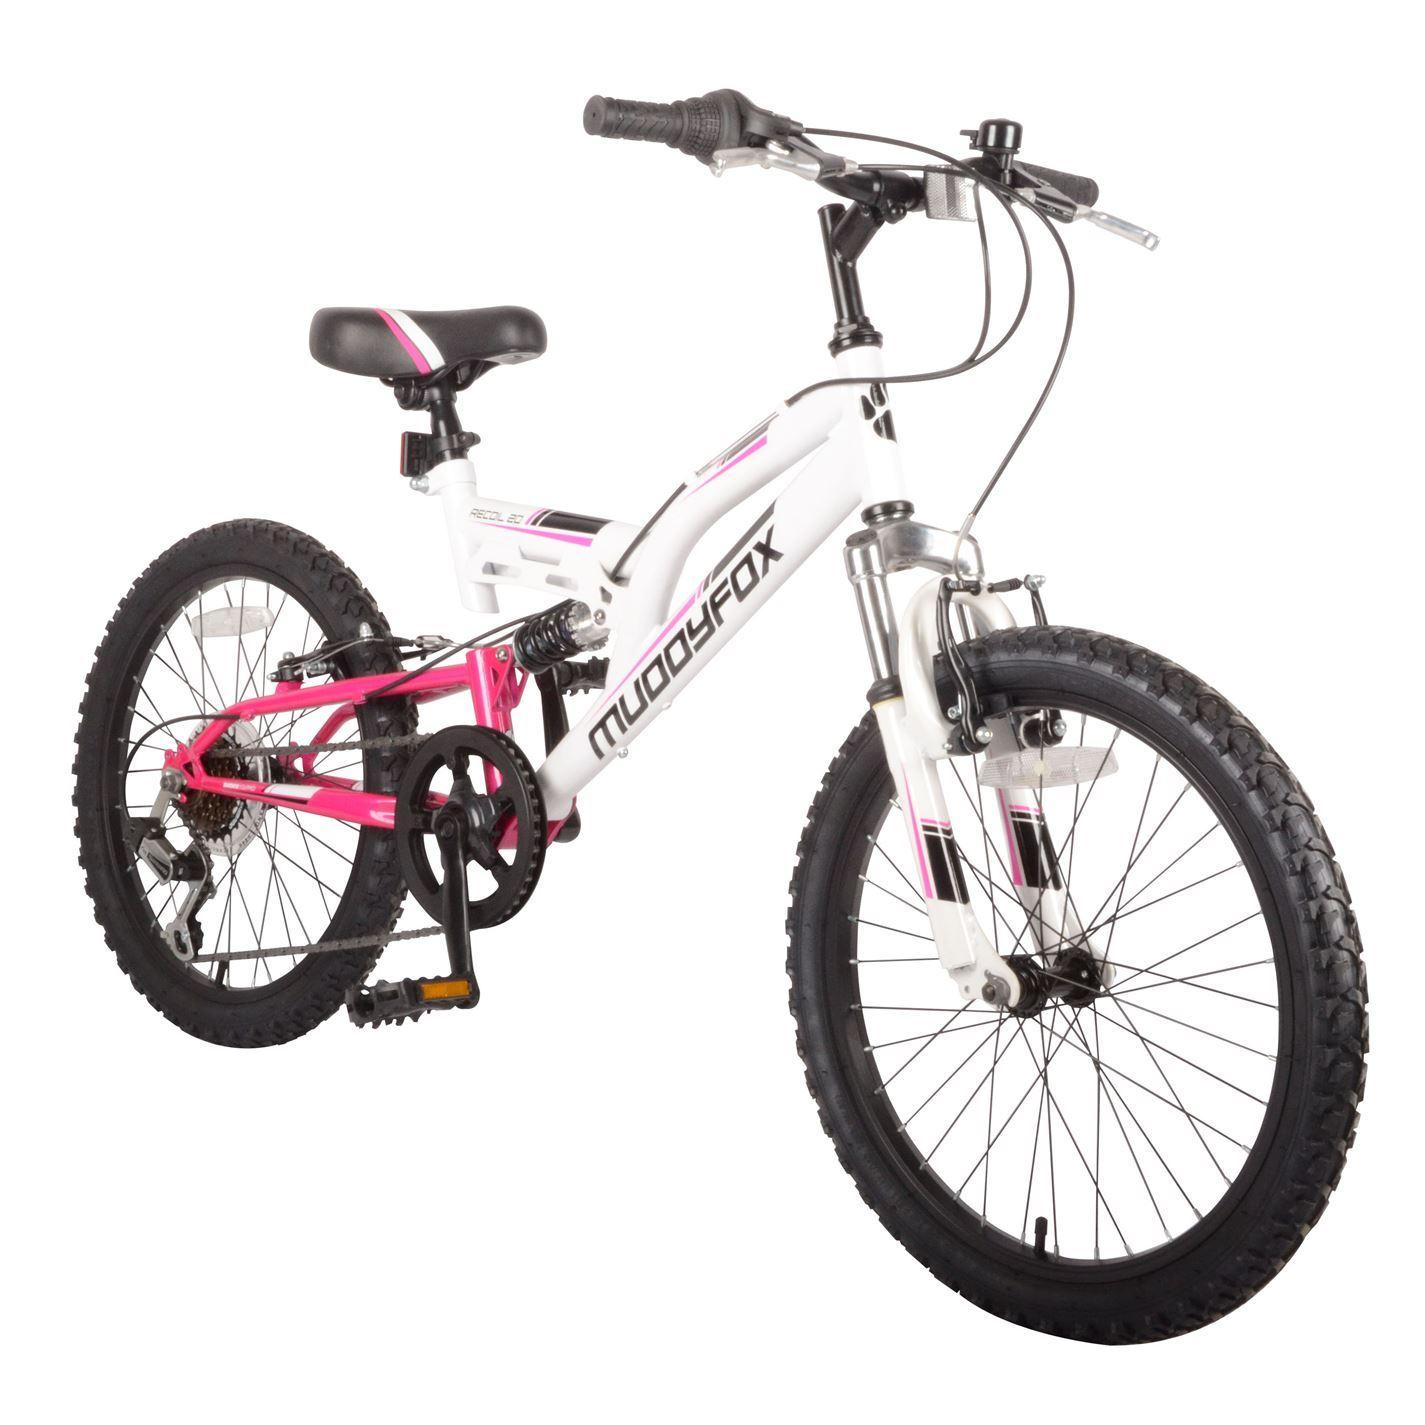 Muddyfox Kids Recoil20 Girls Mountain Bike Dual Suspension